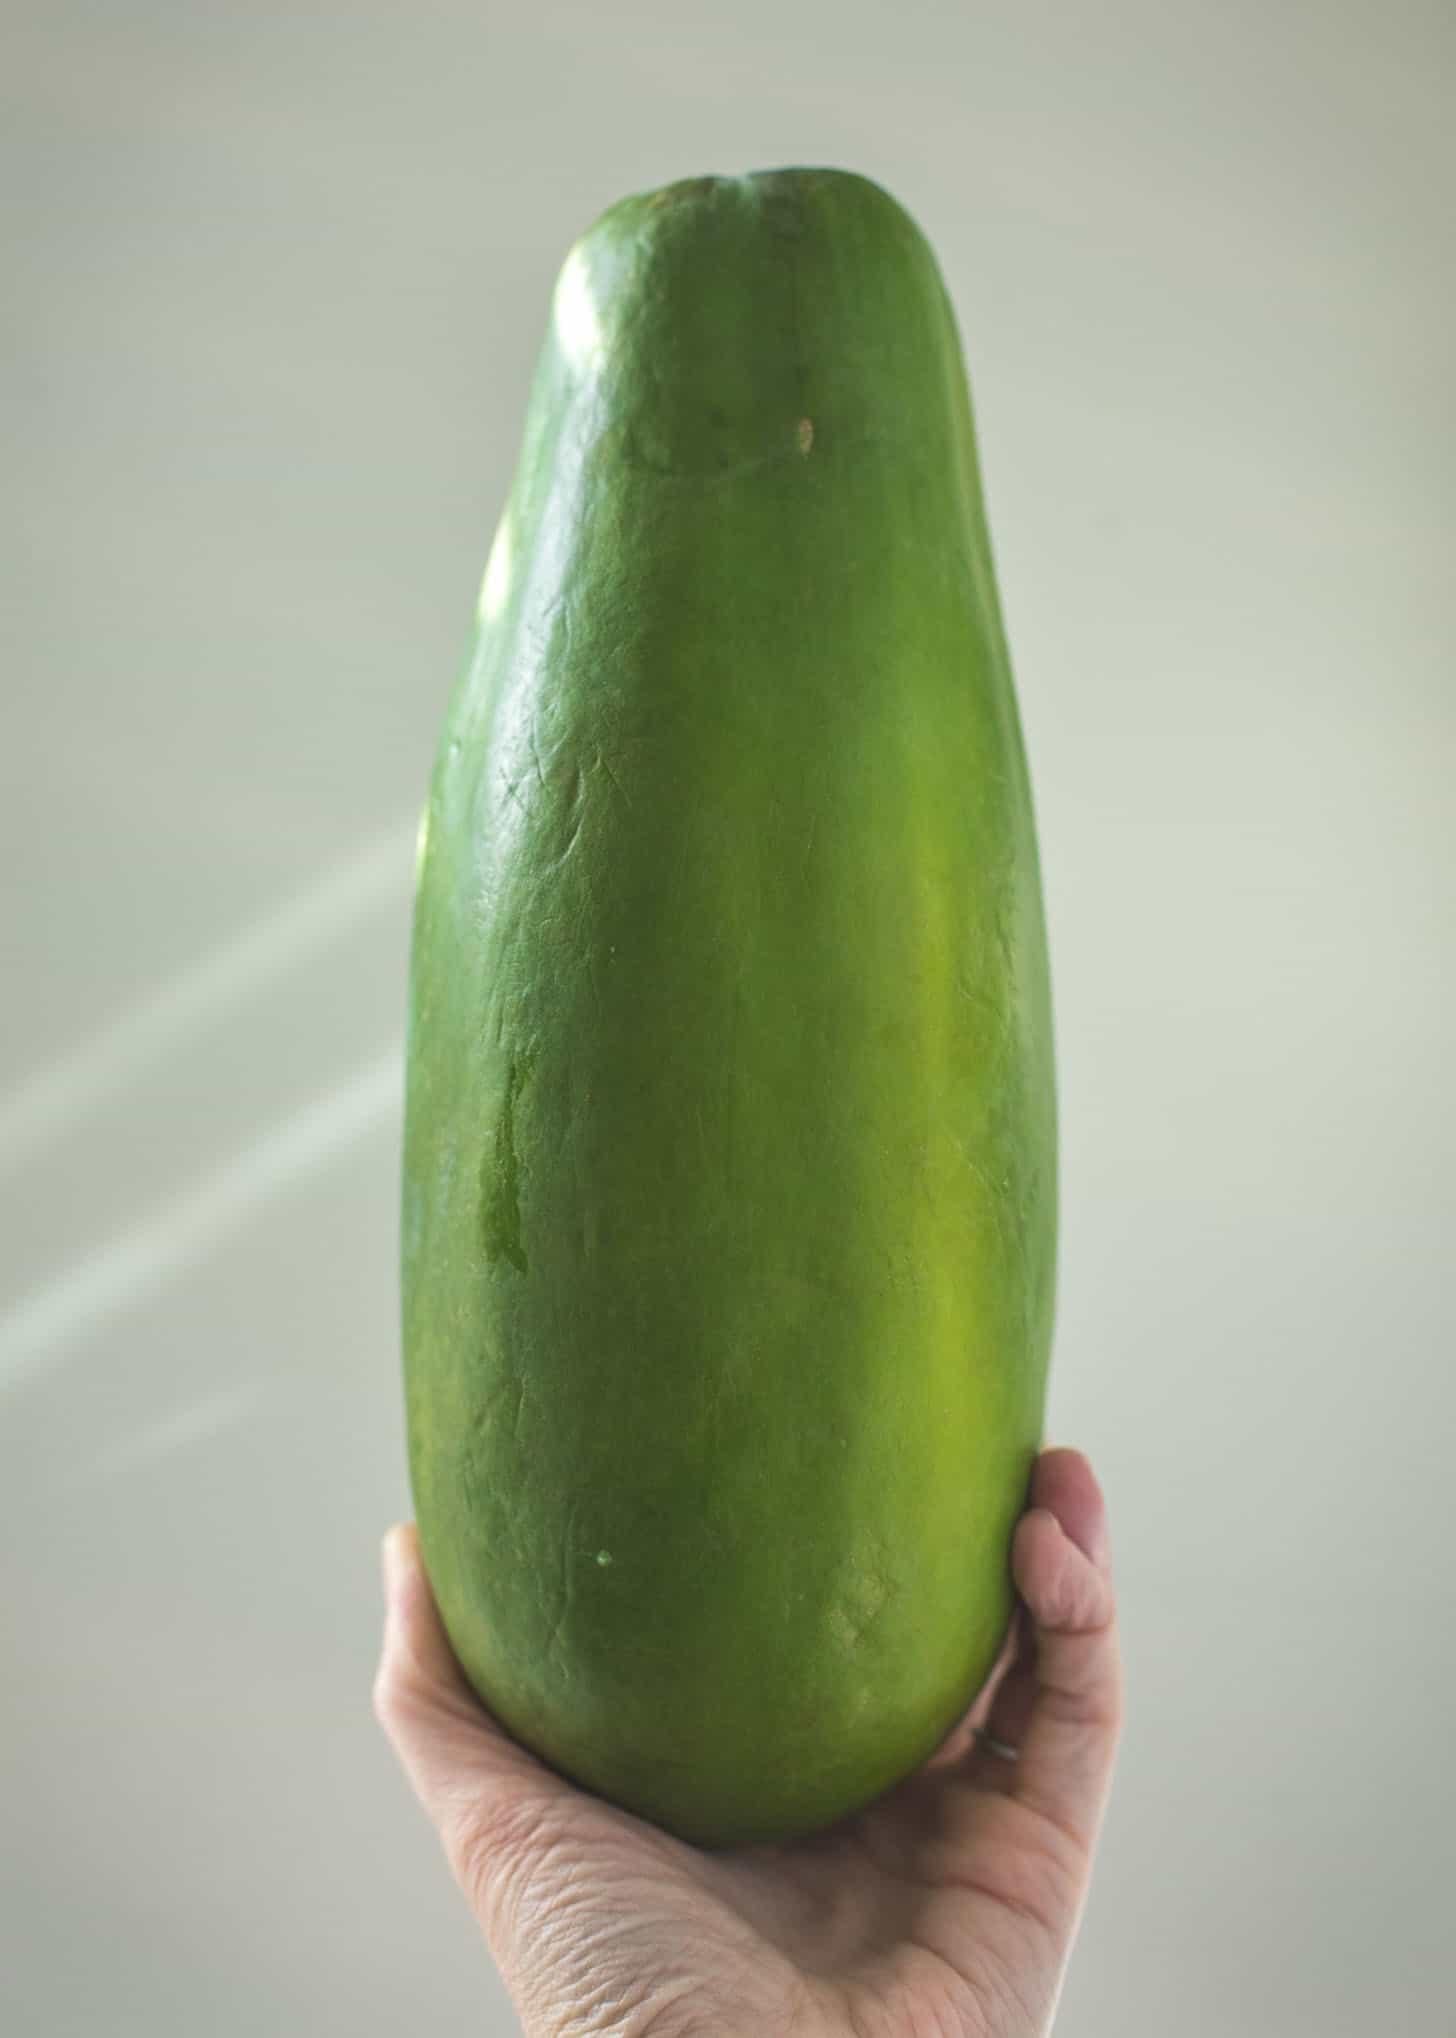 a hand holding a Green papaya